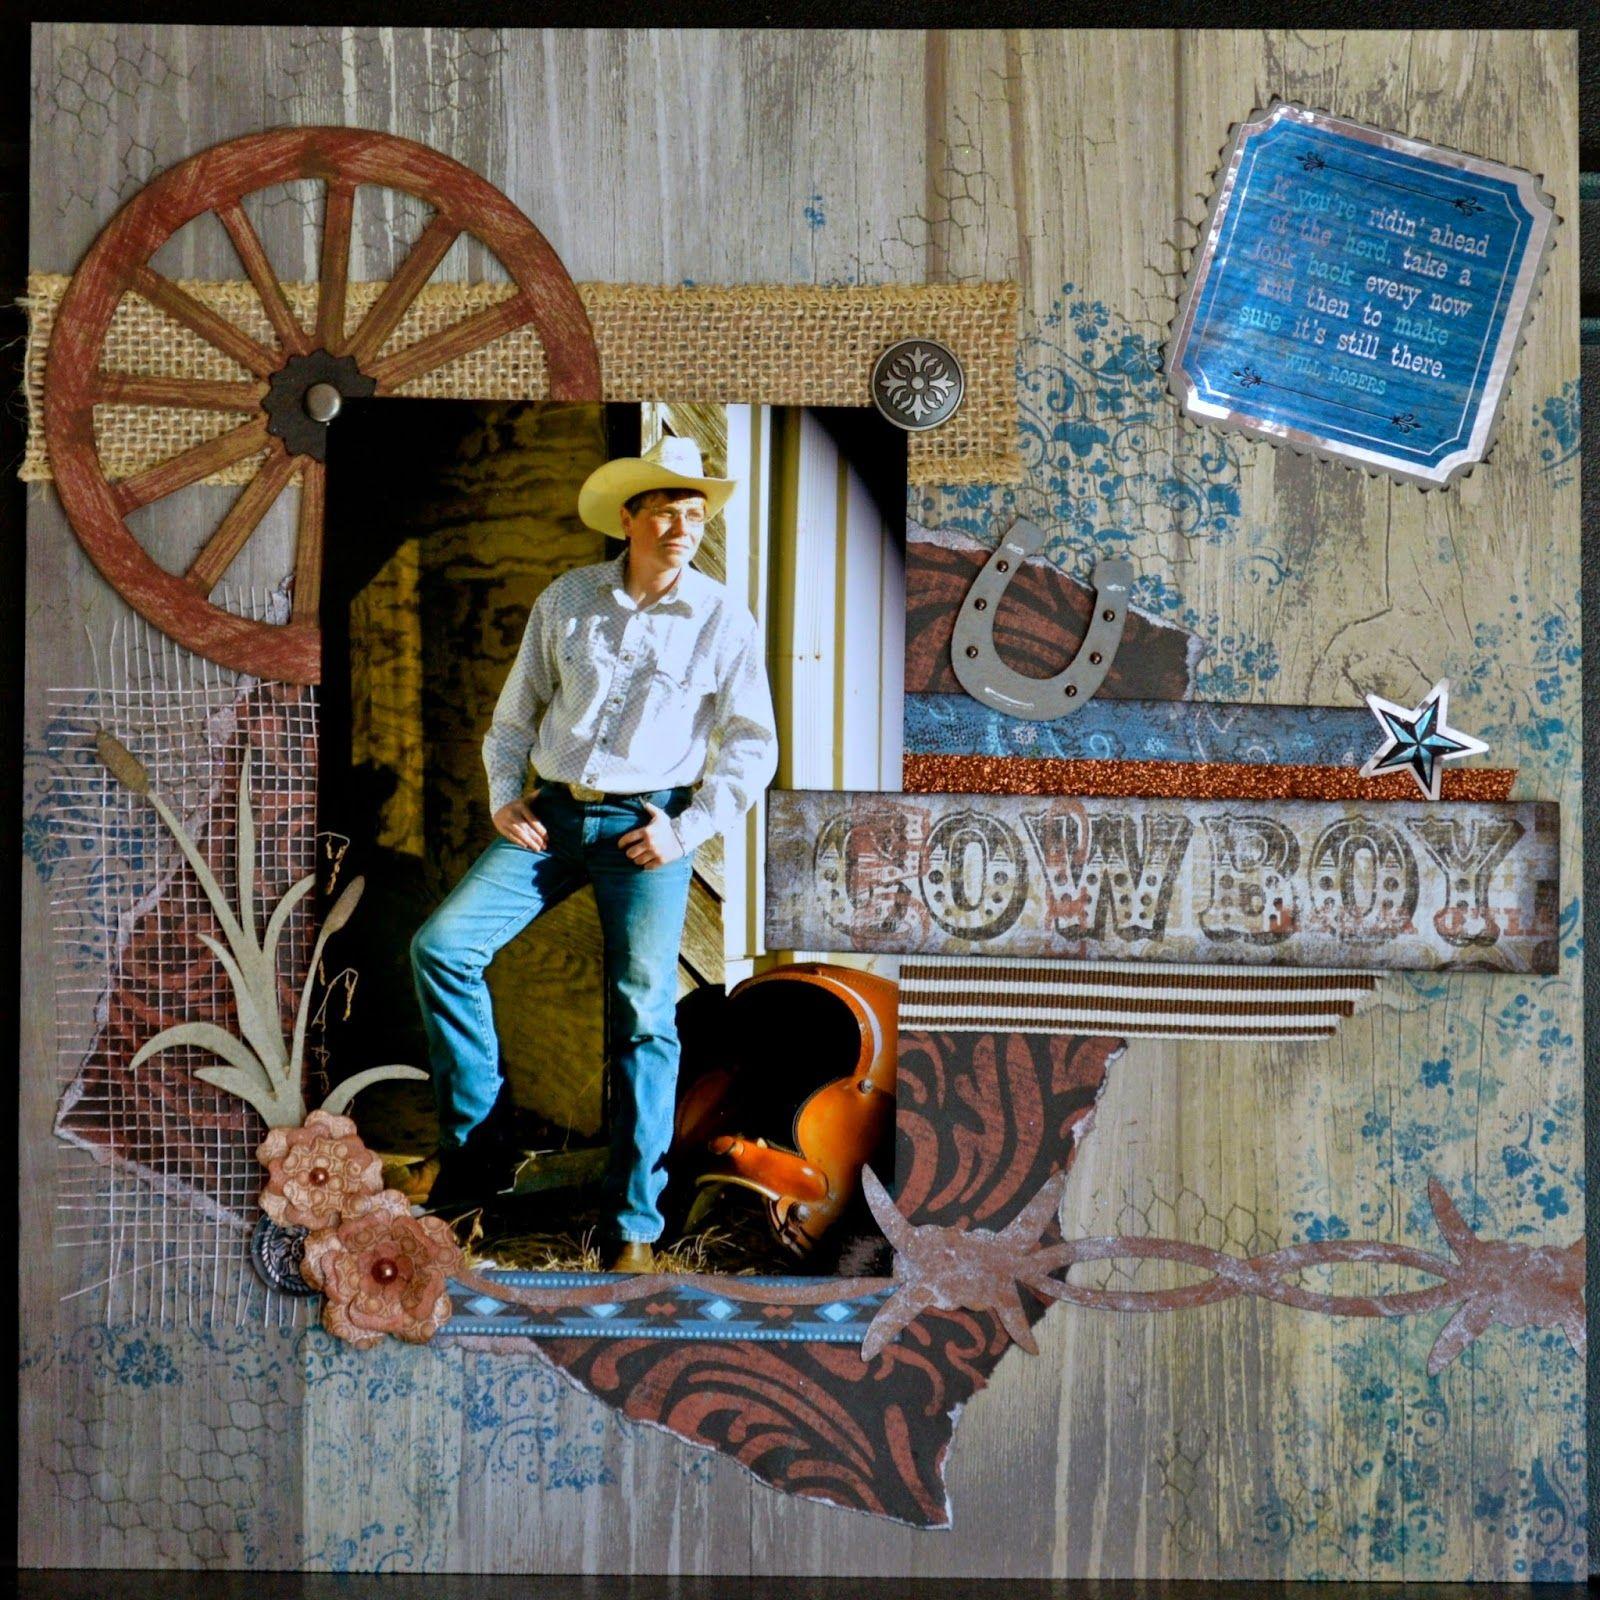 CTMH, Cowboy, Dakota, Timberline, ScrappyHorses.ctmh.com